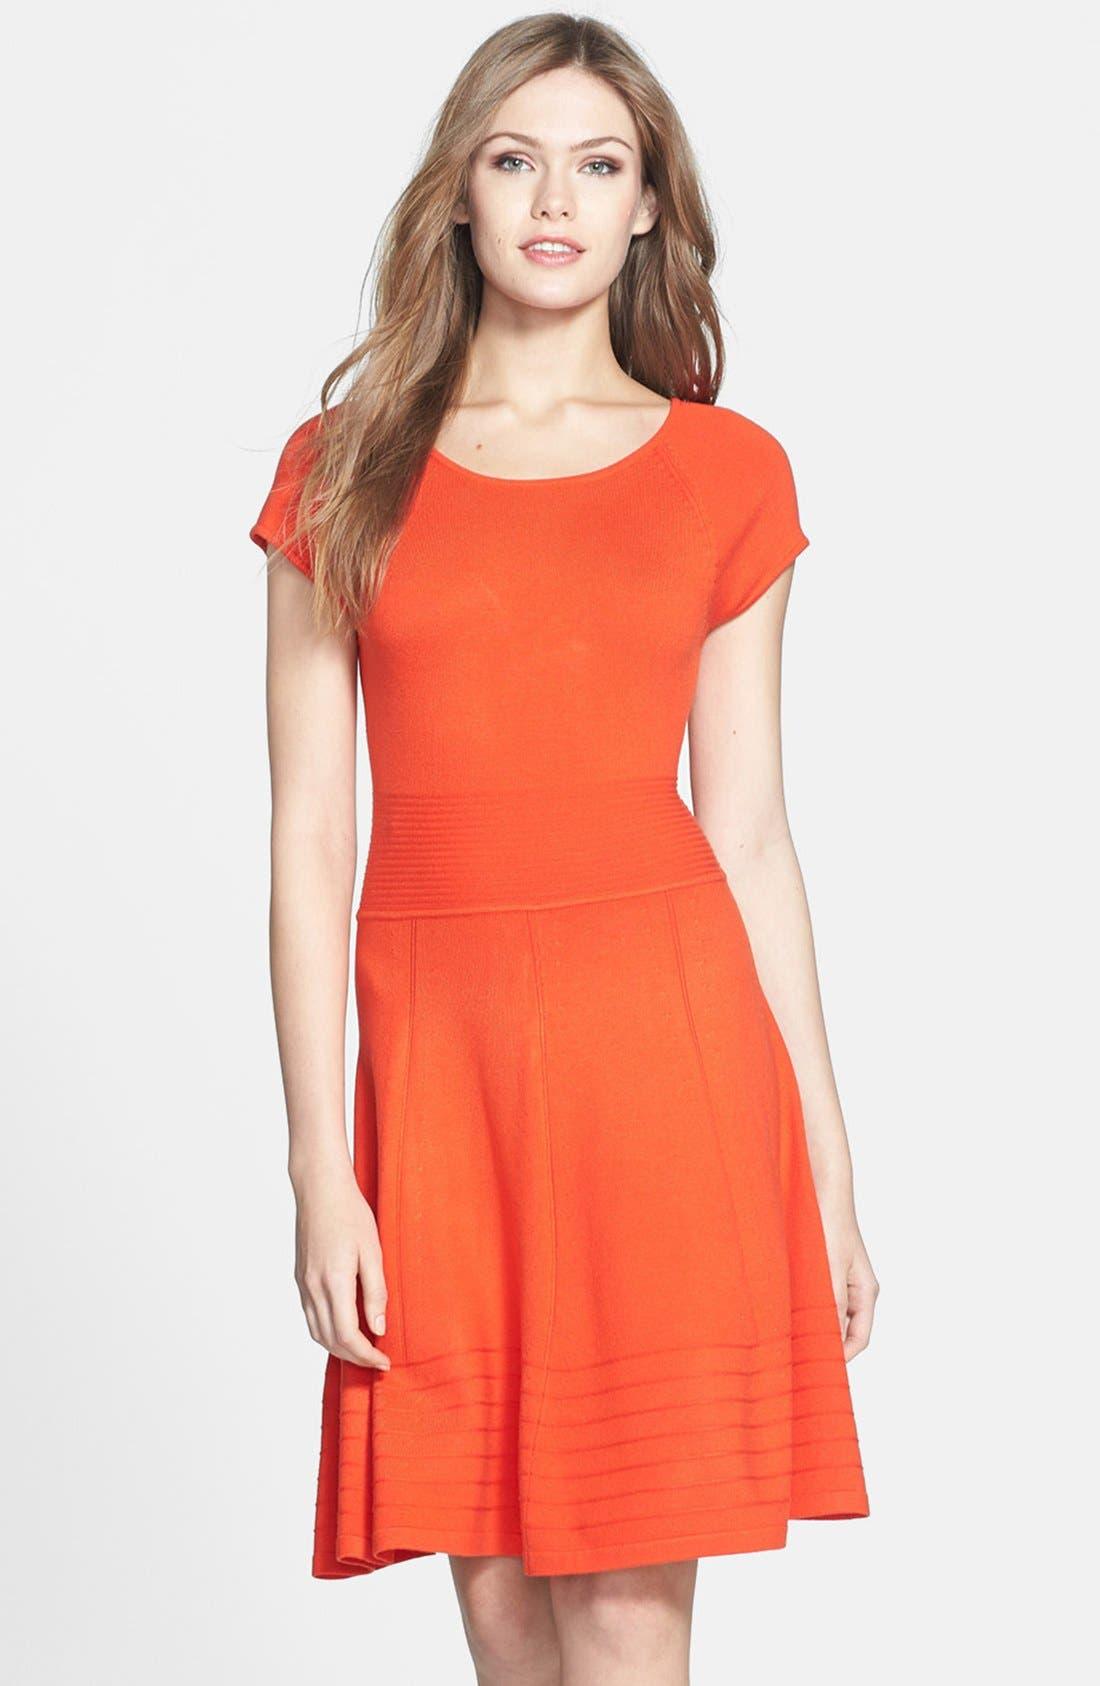 Alternate Image 1 Selected - Eliza J Fit & Flare Sweater Dress